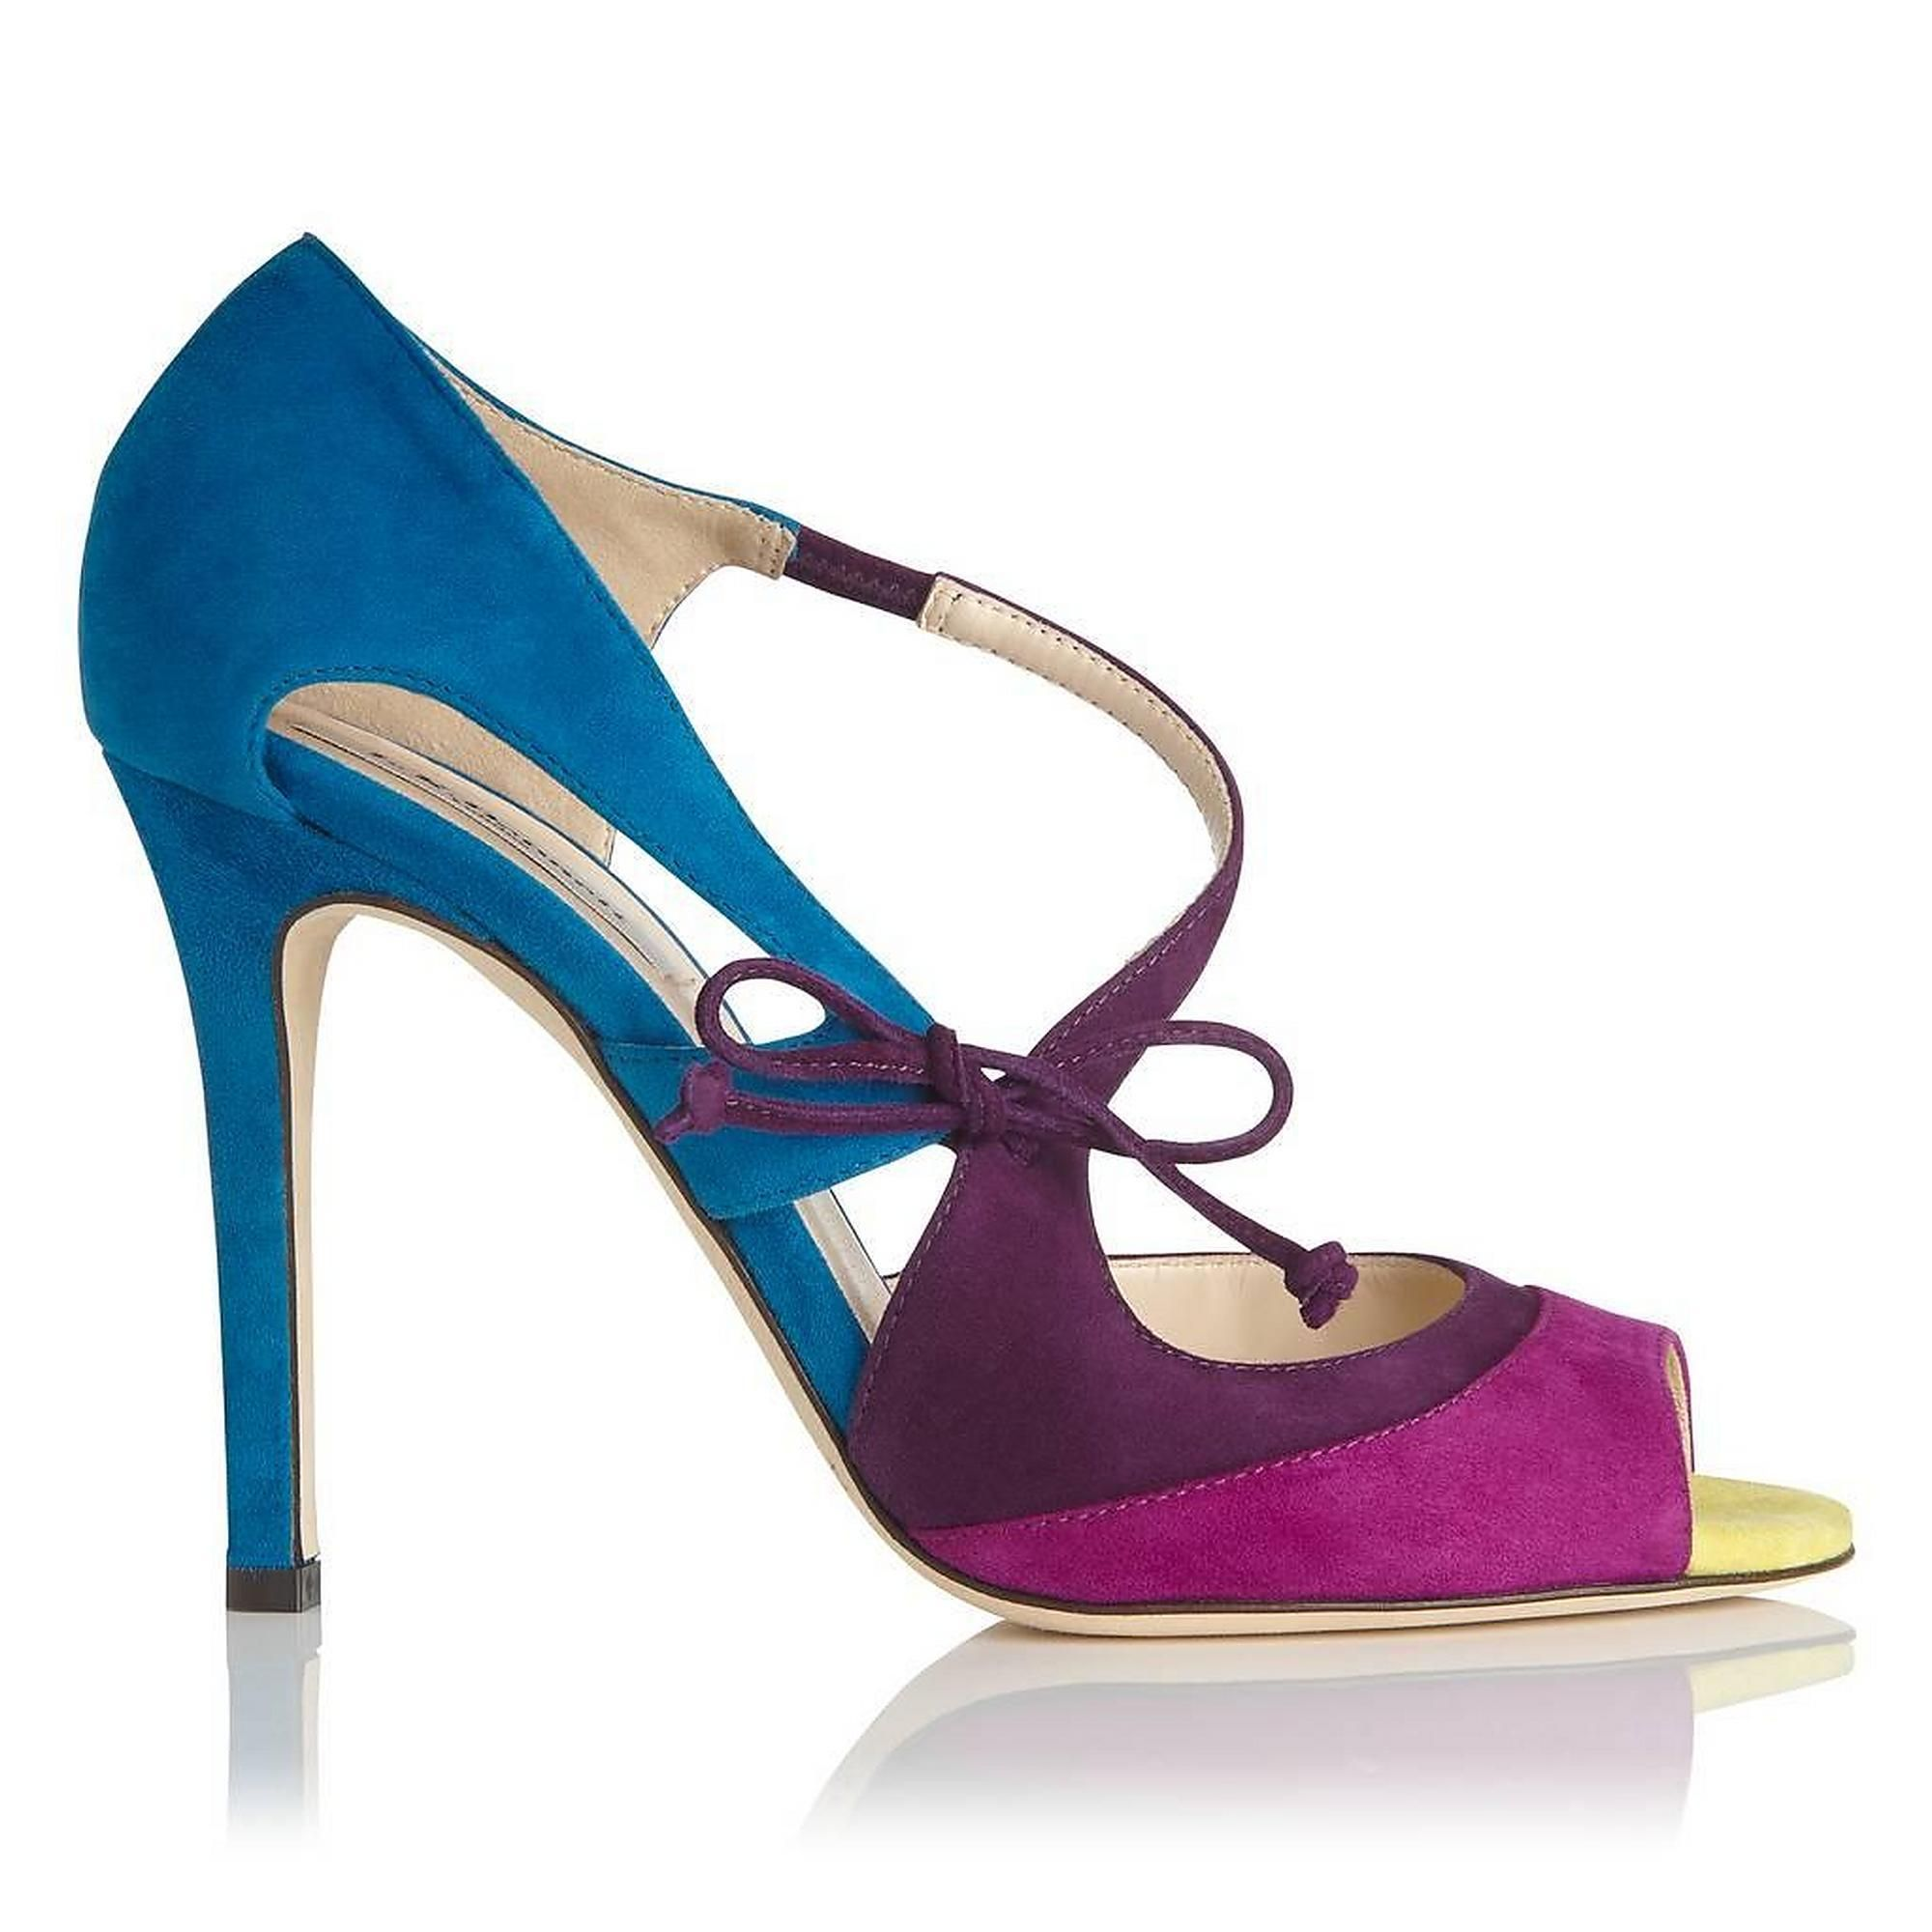 Lucile Raisin Orchid Suede Formal Sandals   Shoes   Collections   L.K.Bennett, London